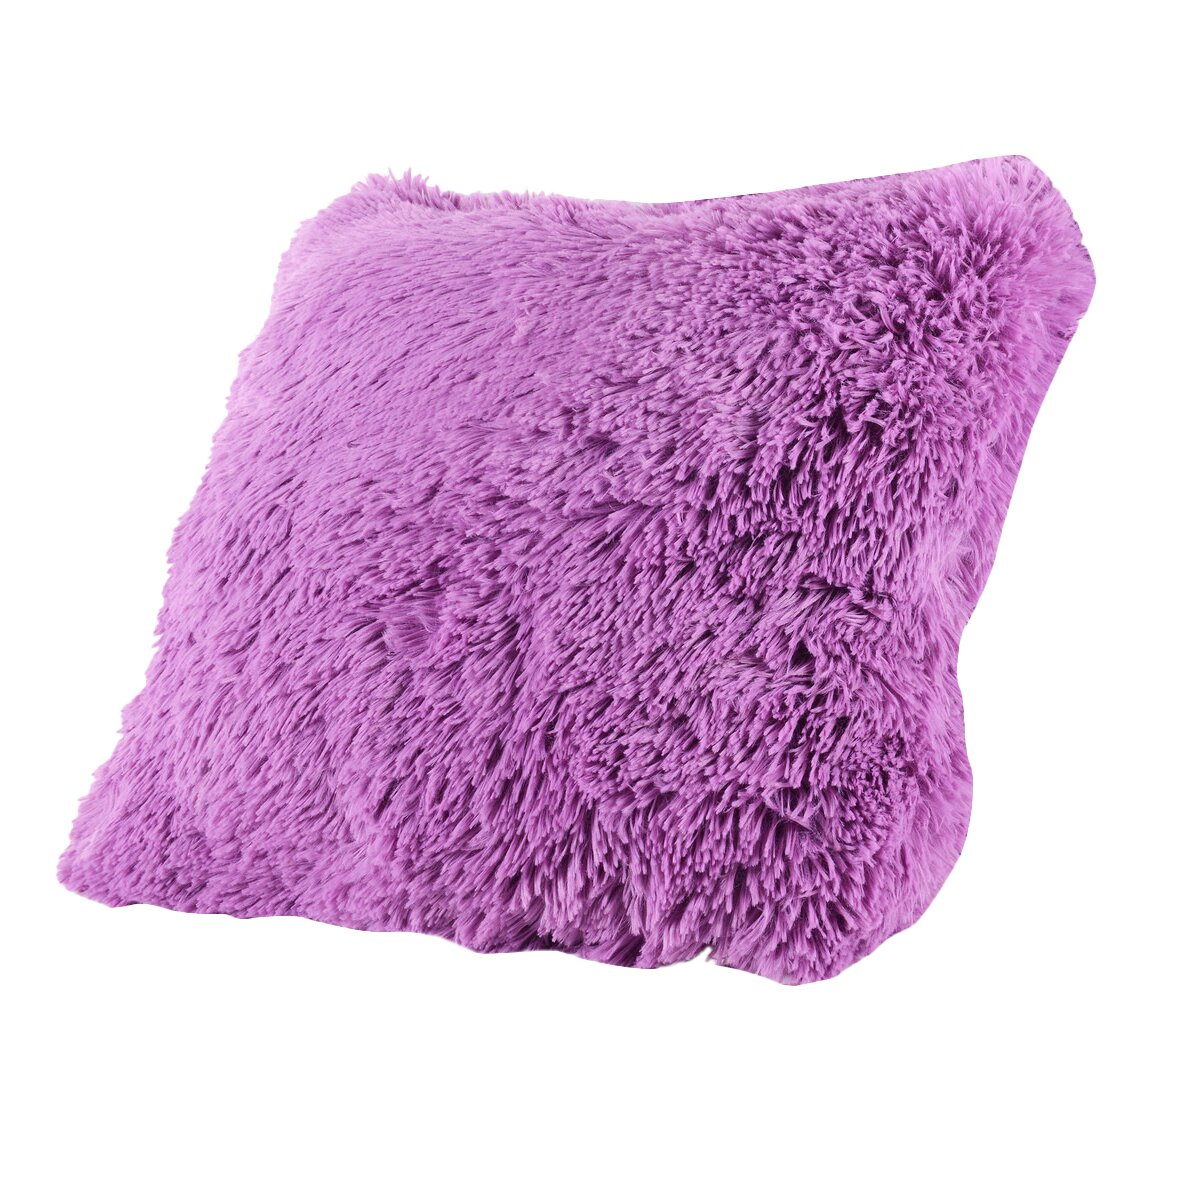 Mercer41 Carnot Very Soft and Comfy Plush Throw Pillow & Reviews Wayfair.ca